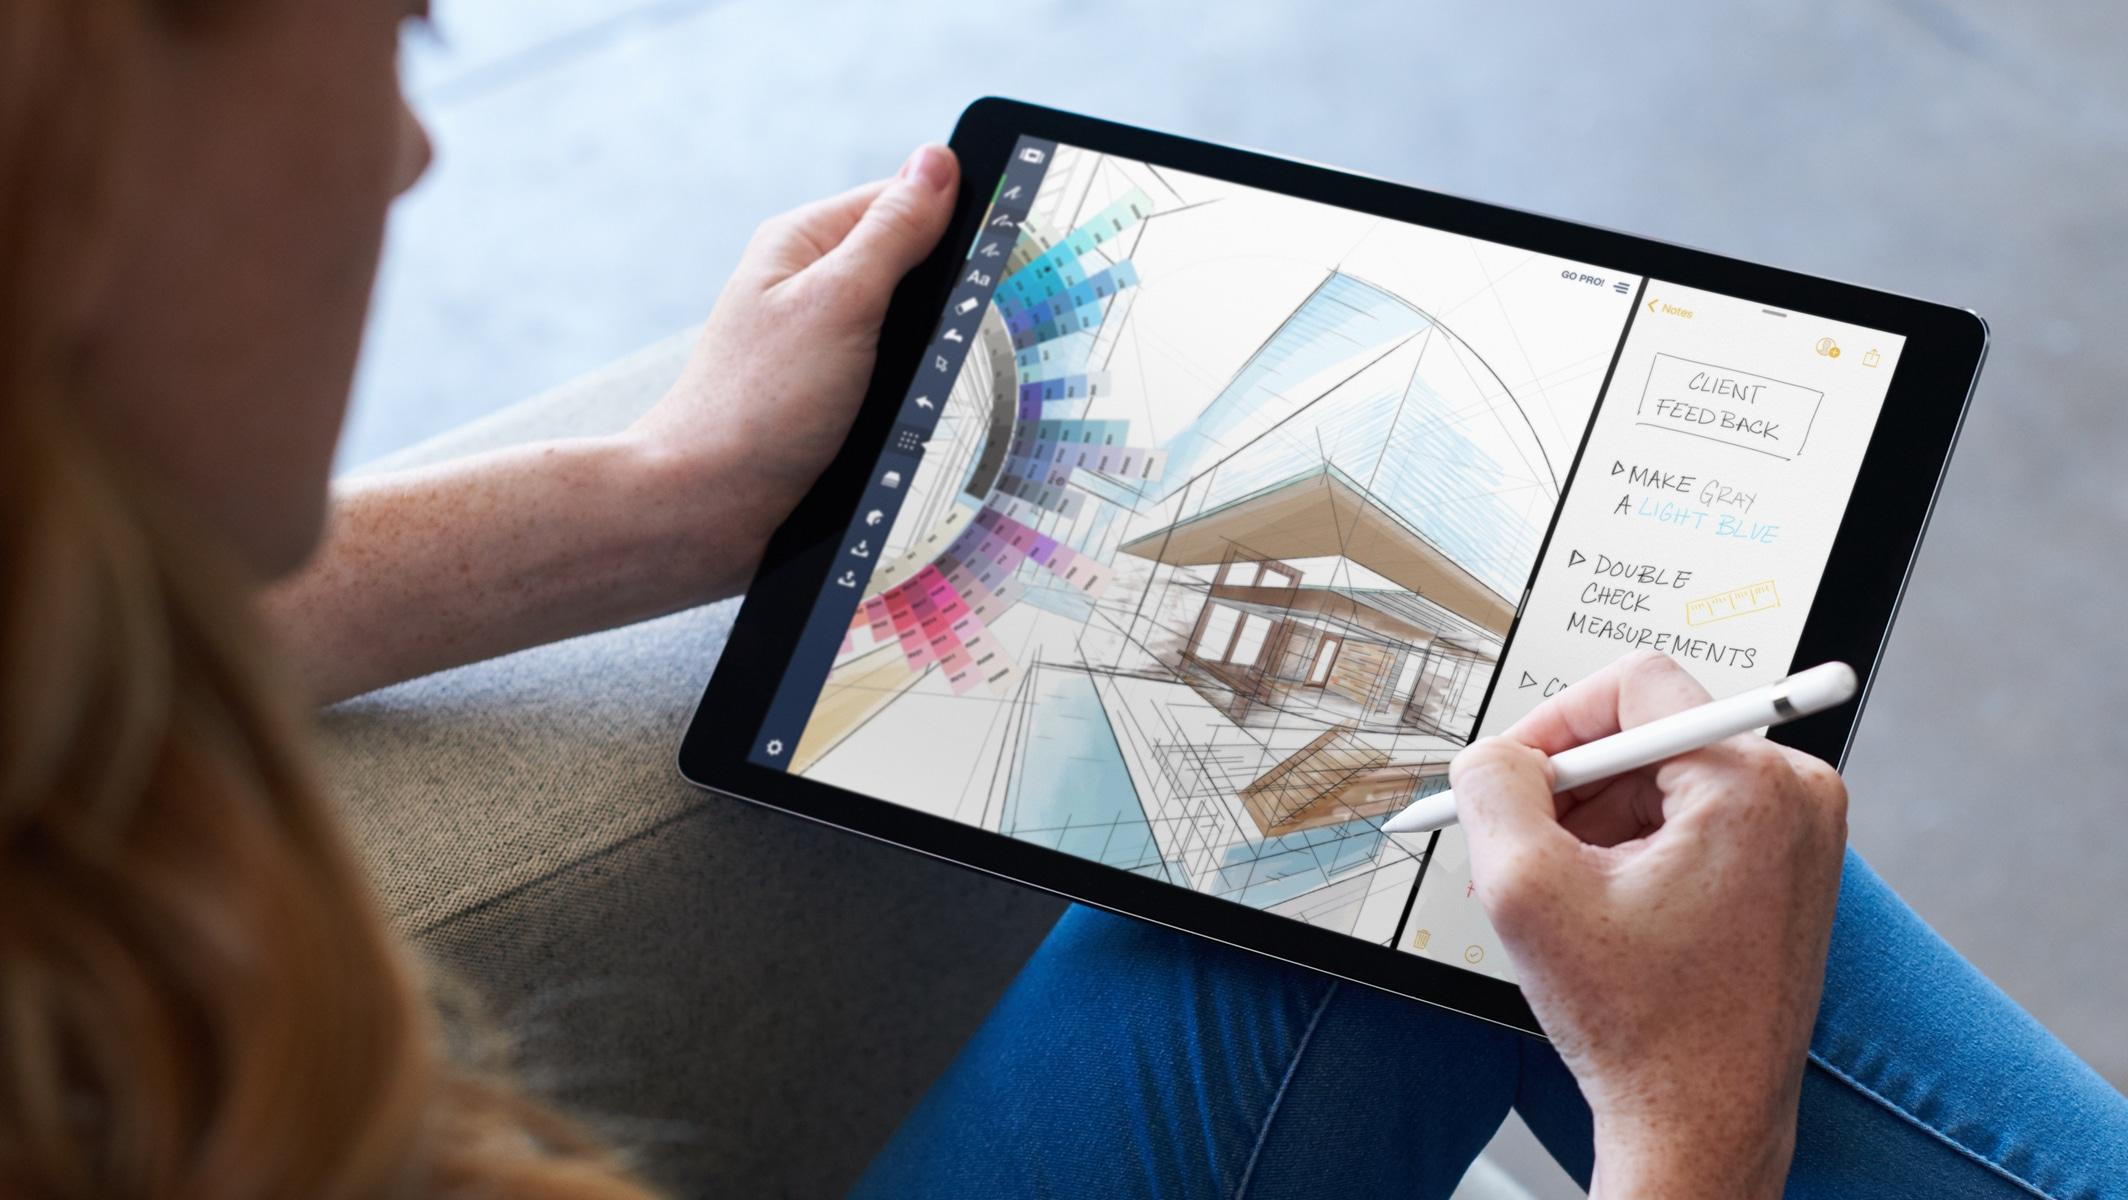 Apple Pencil on iPad Pro with iOS 11